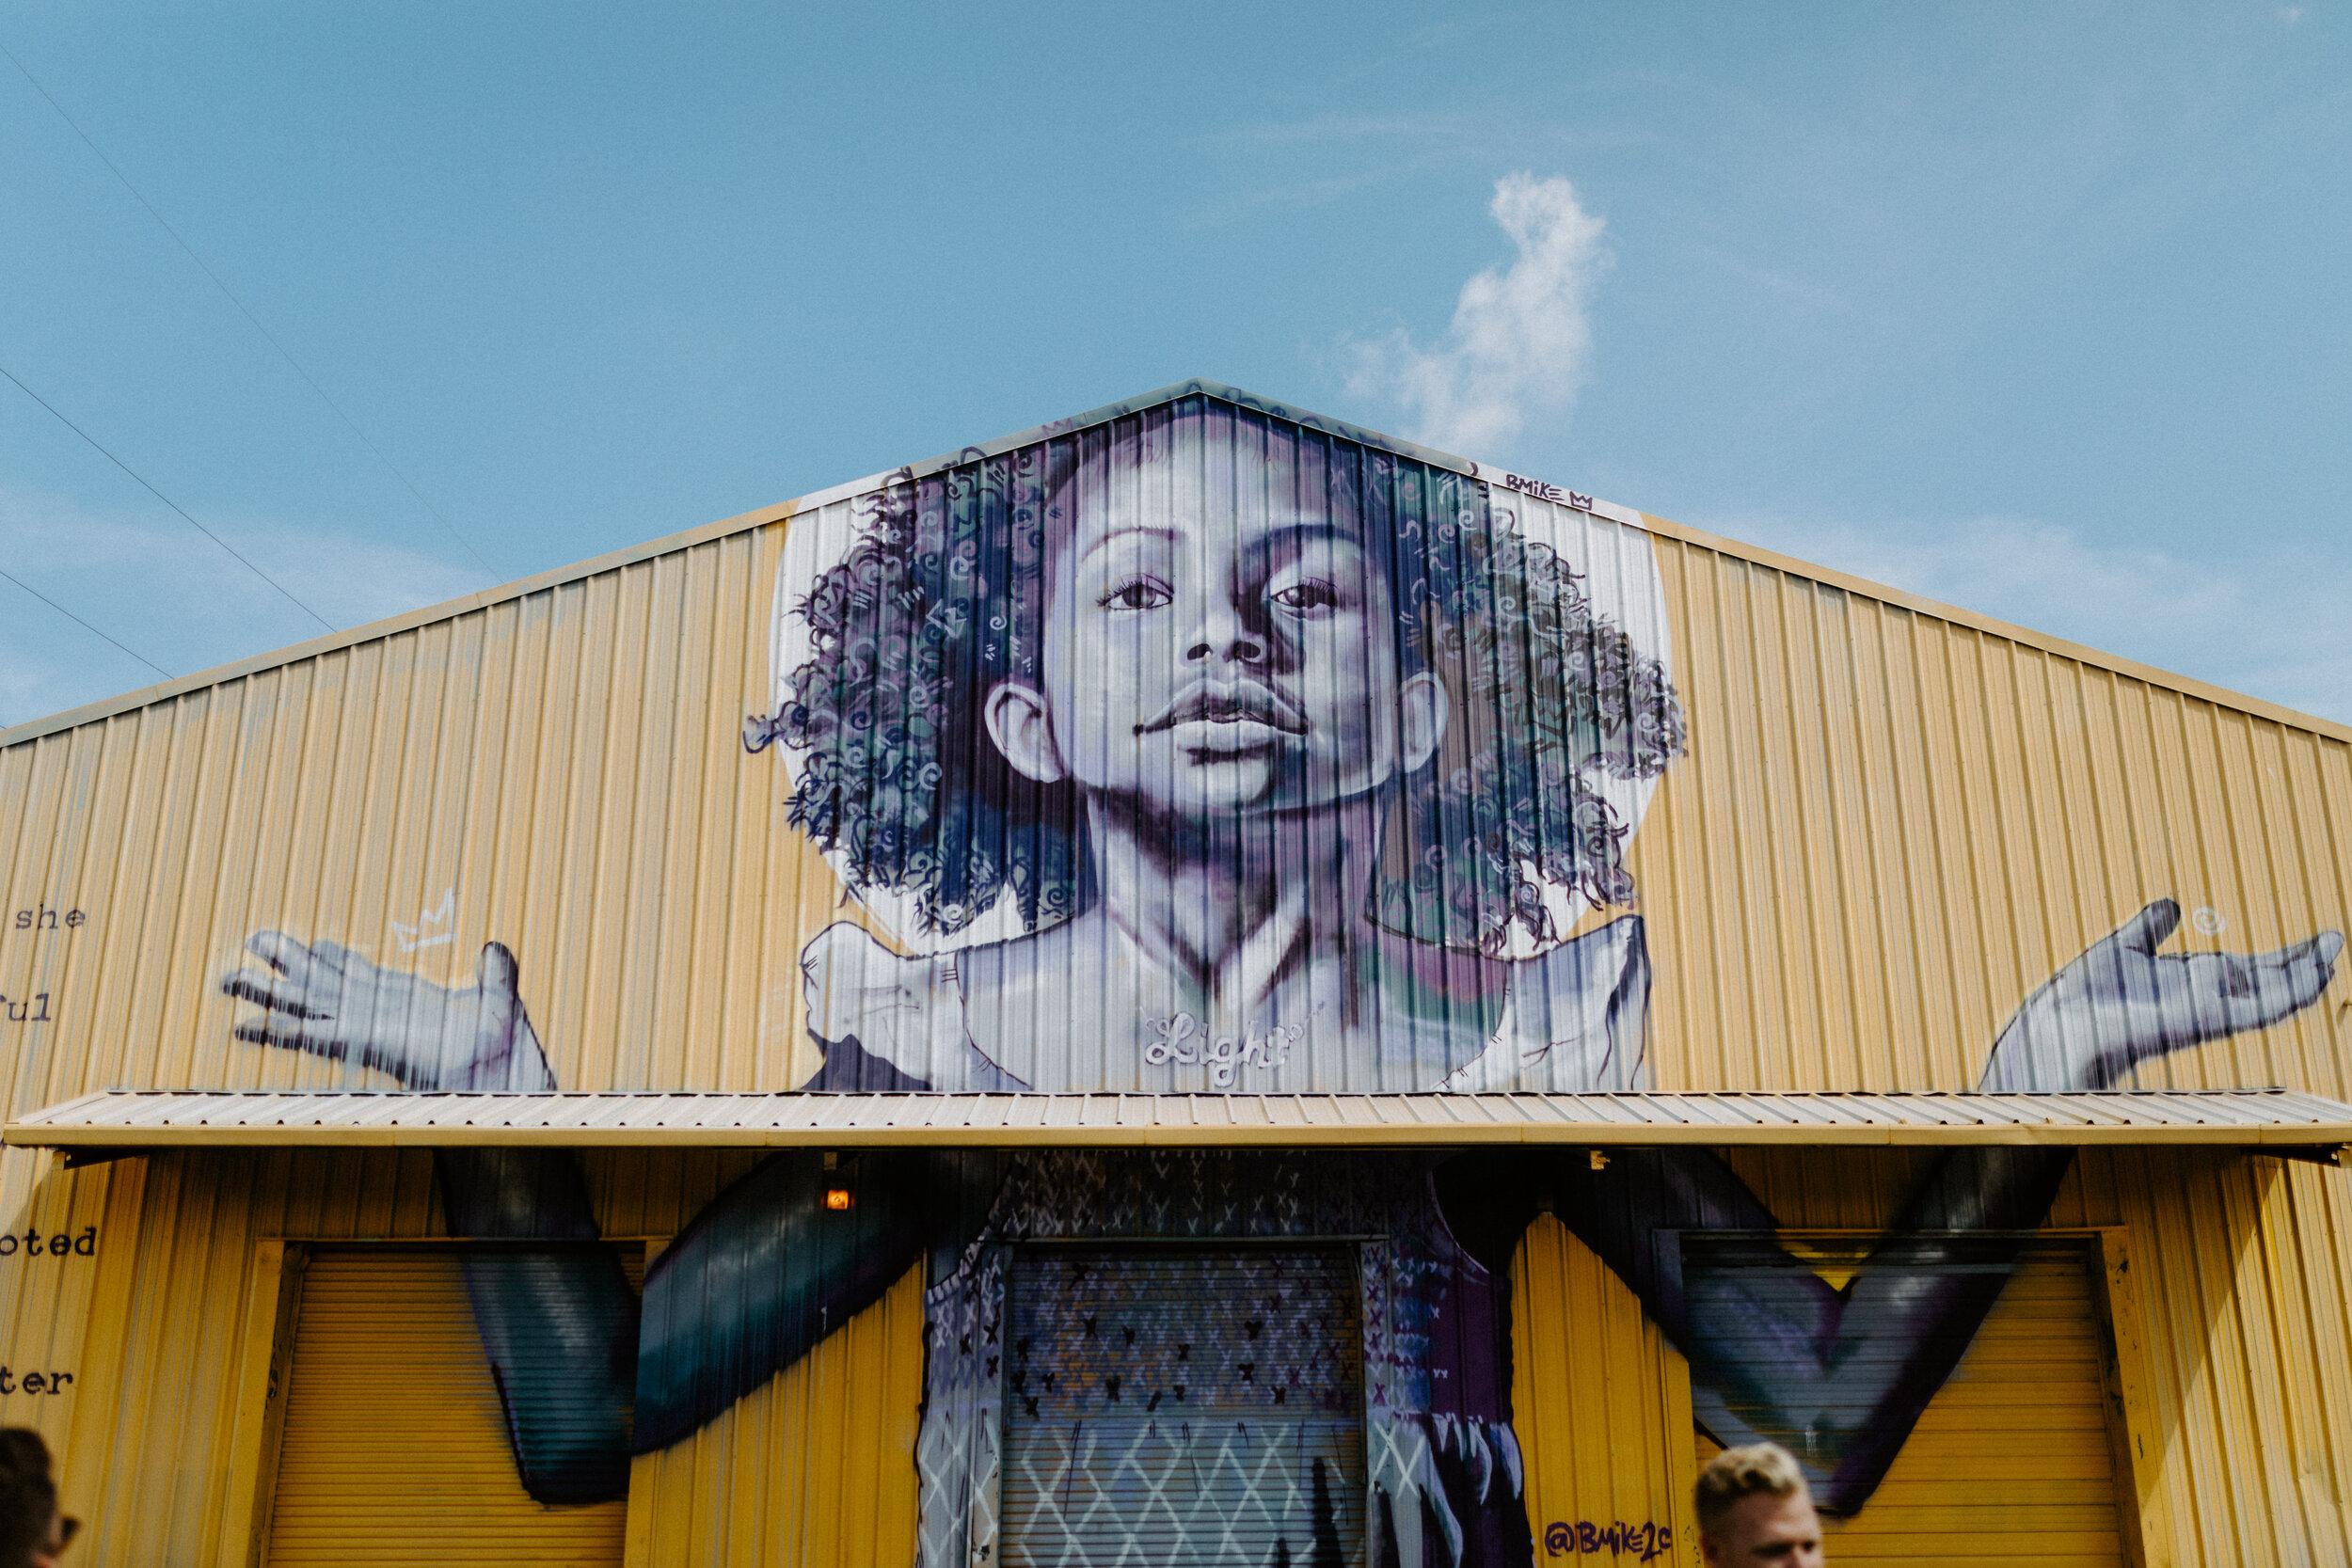 New Orleans Street Art on Plessy Way